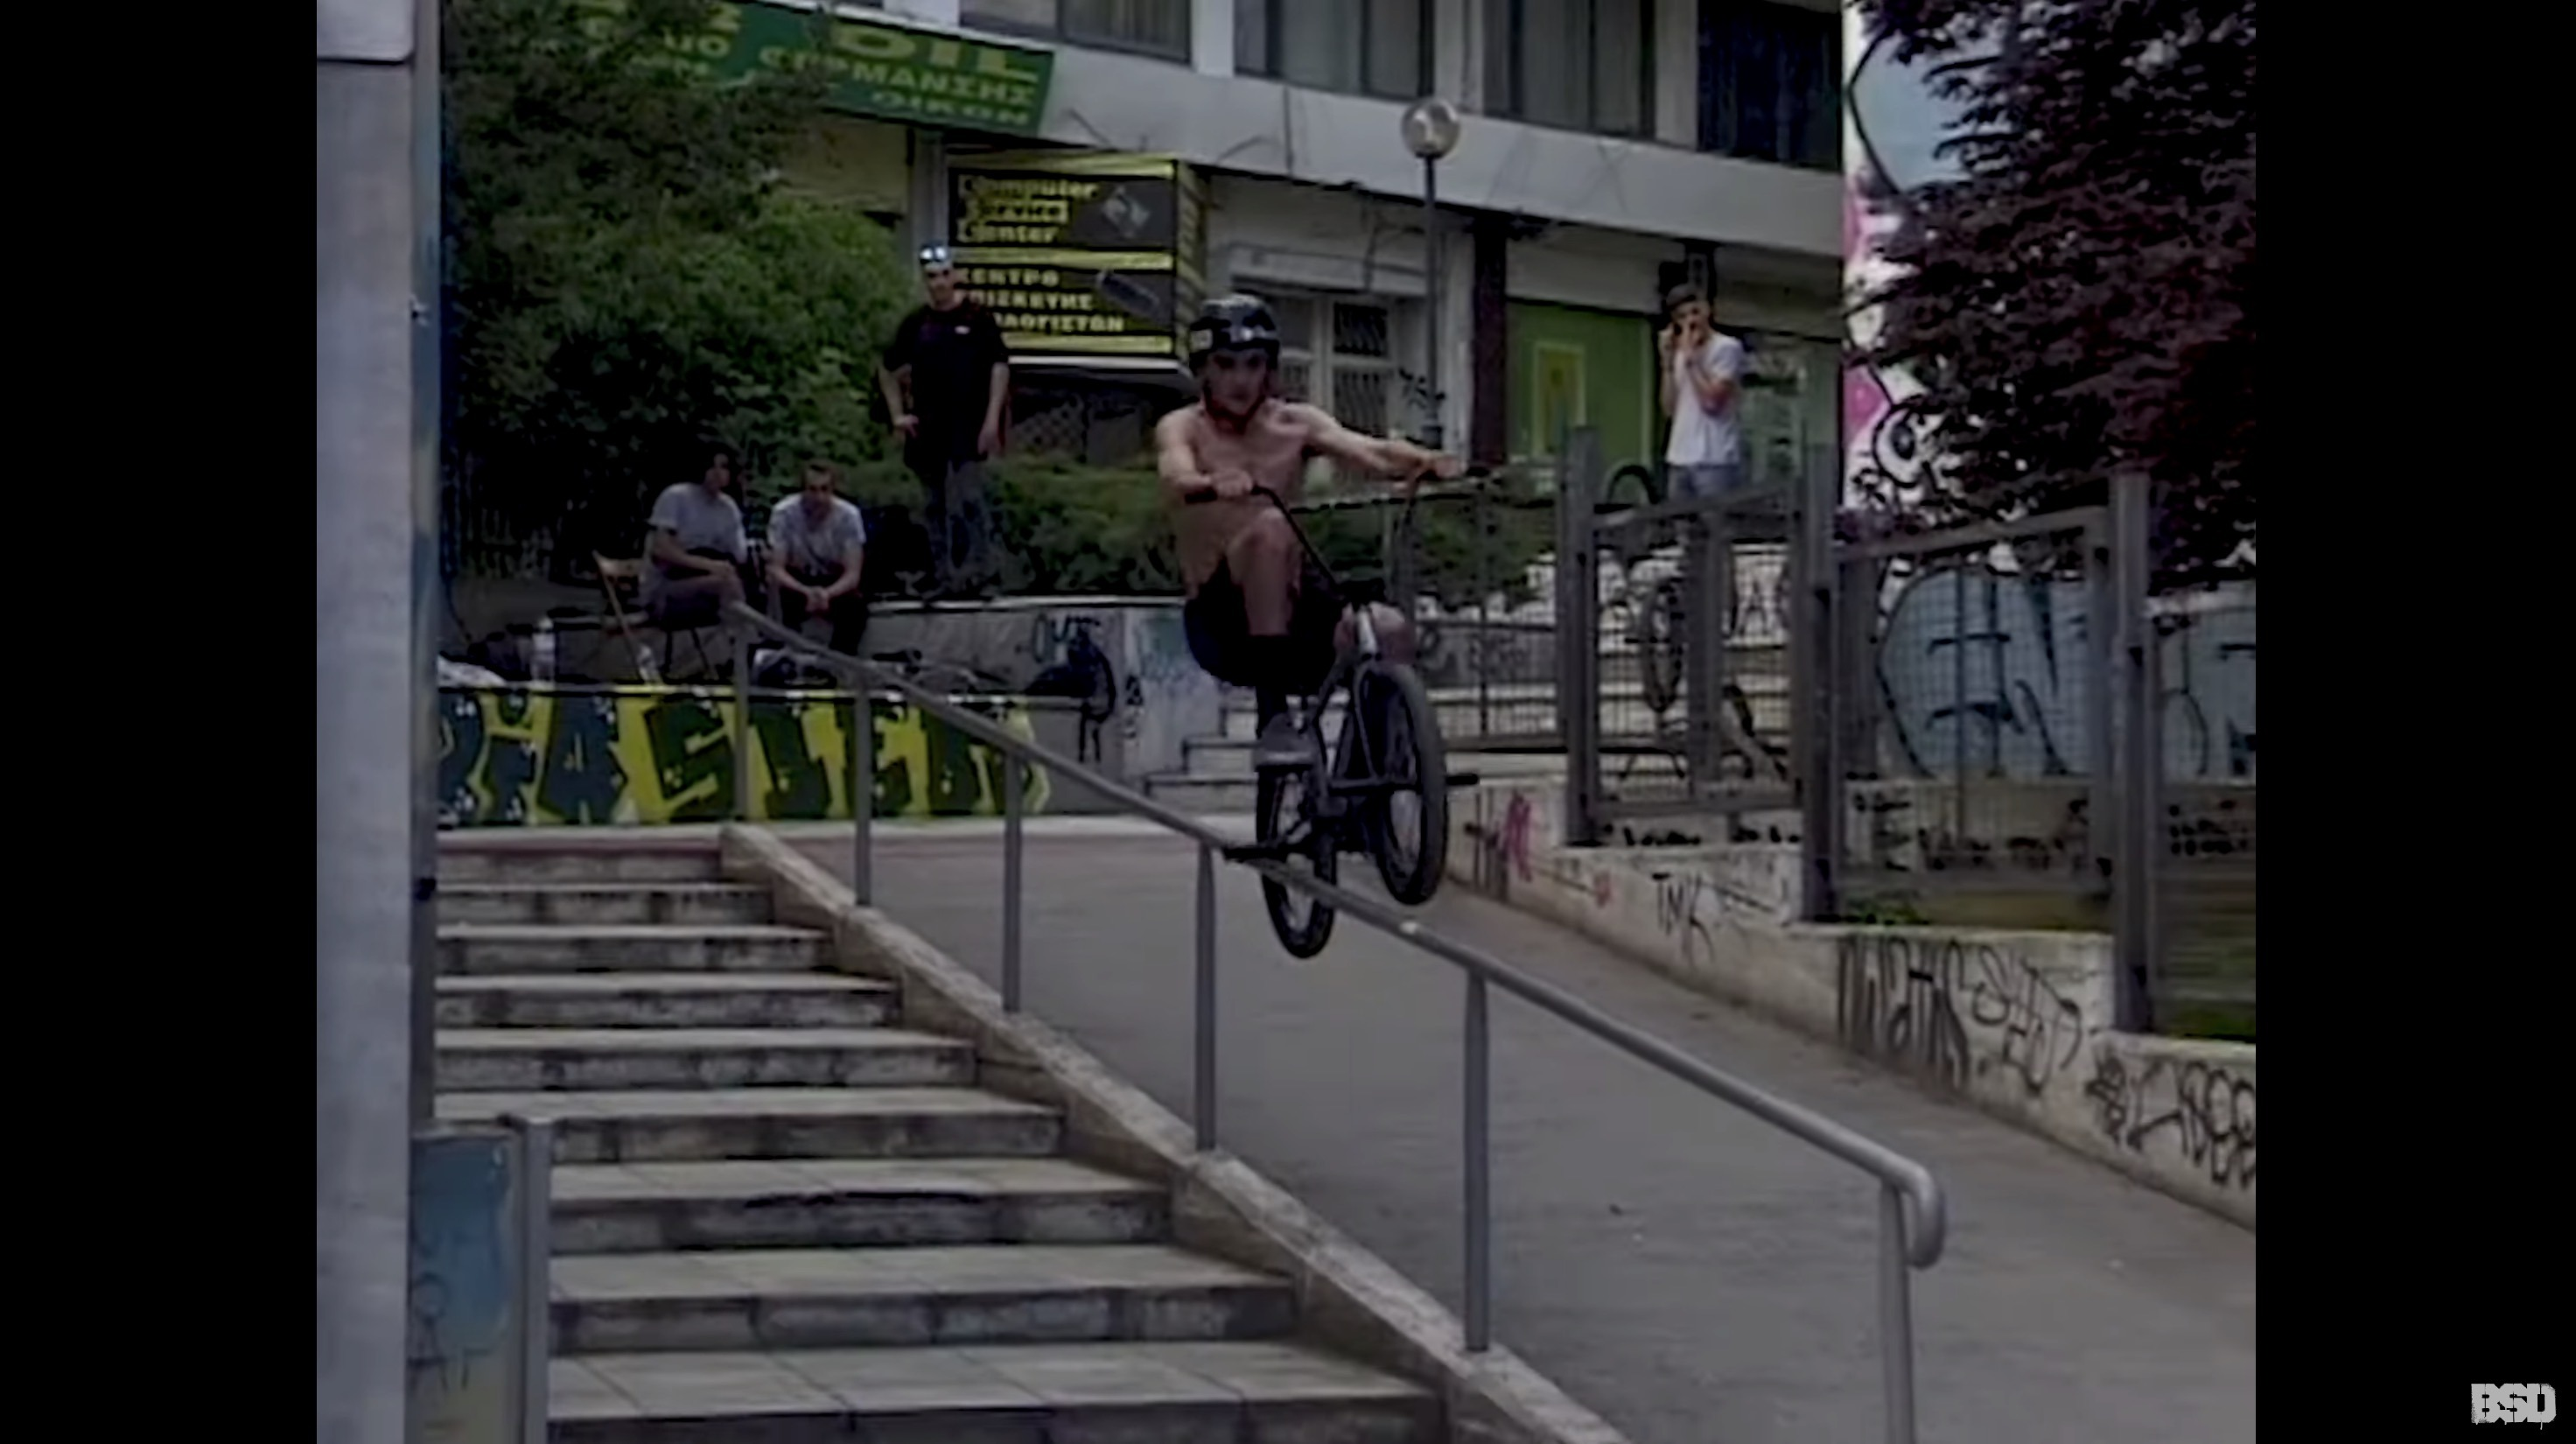 BSD: Craig Sime - Glasgow to Greece